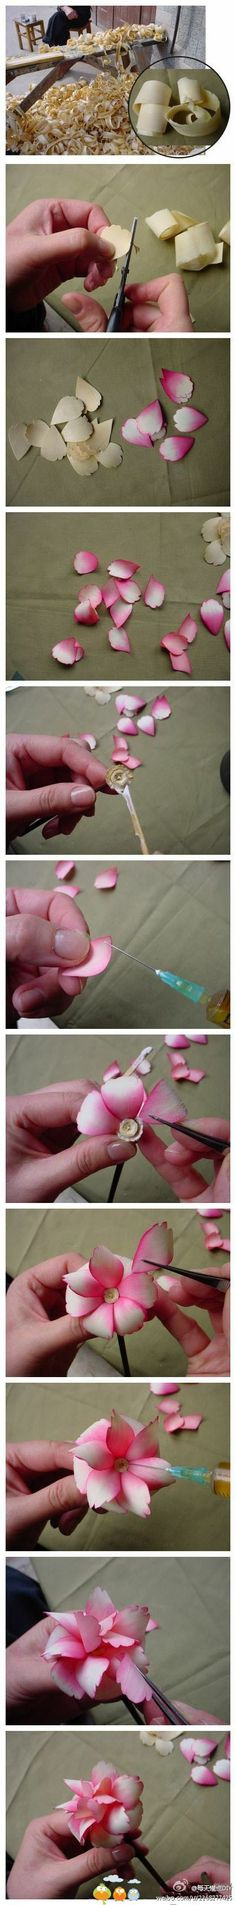 wood shavings rose